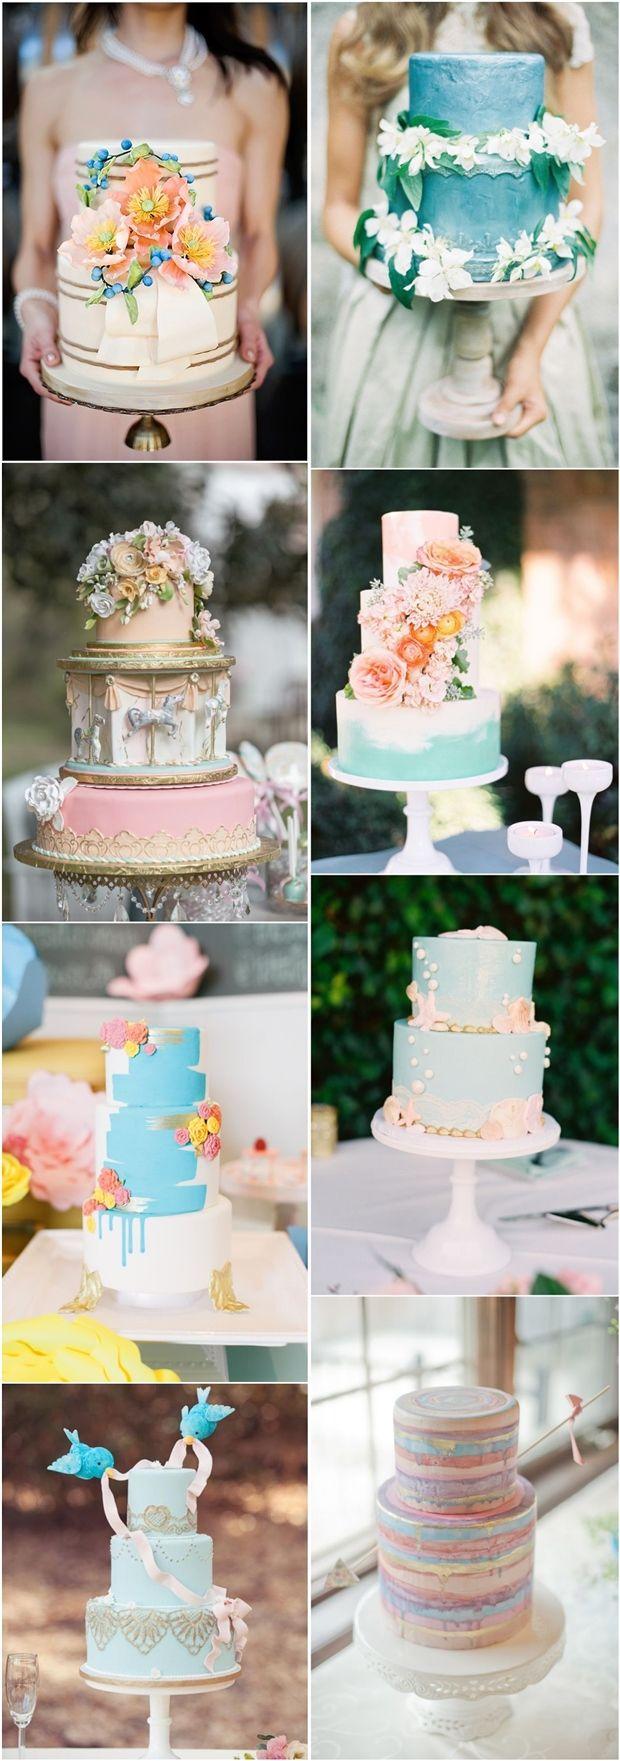 Pastel Whimsical Wedding Cakes / http://www.deerpearlflowers.com/25-whimsical-wedding-cakes-to-get-inspired/